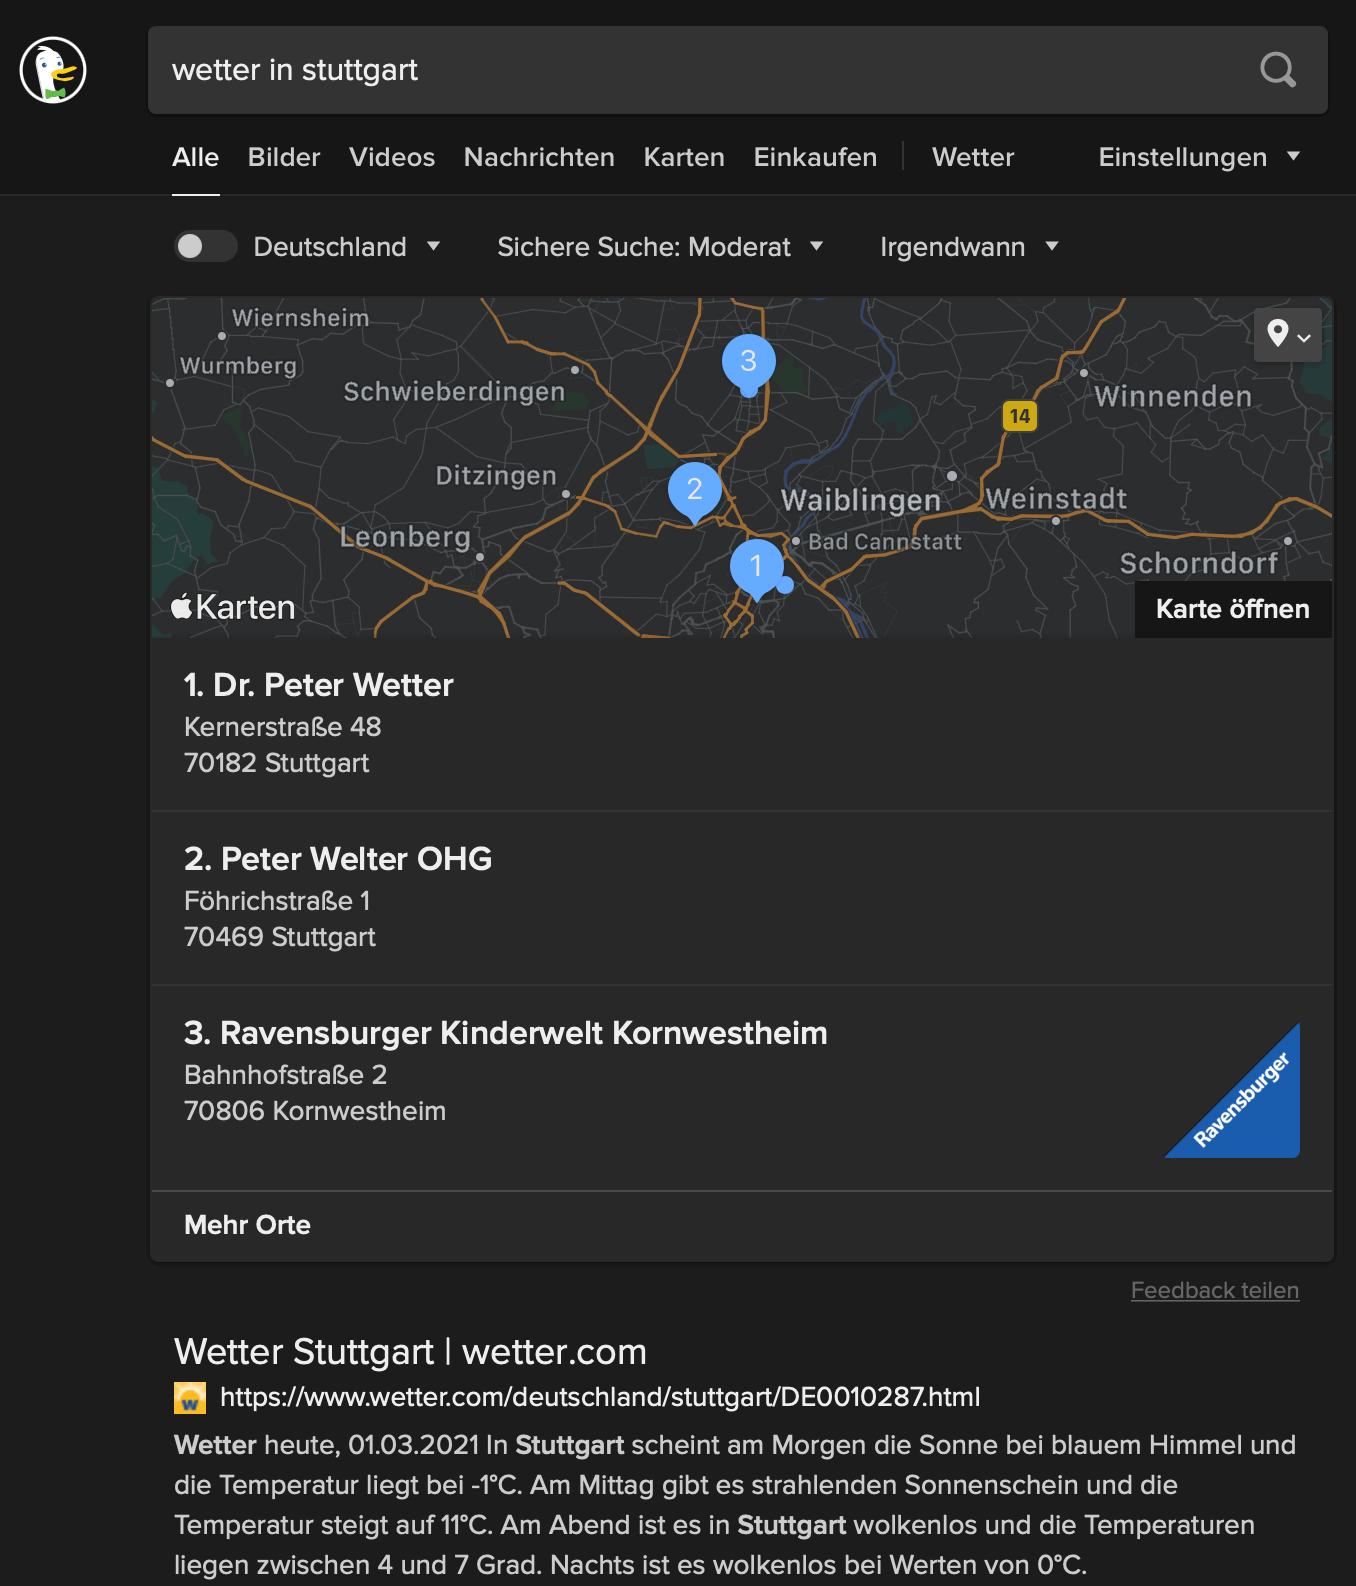 """Wetter in Stuttgart"" bei DuckDuckGo"